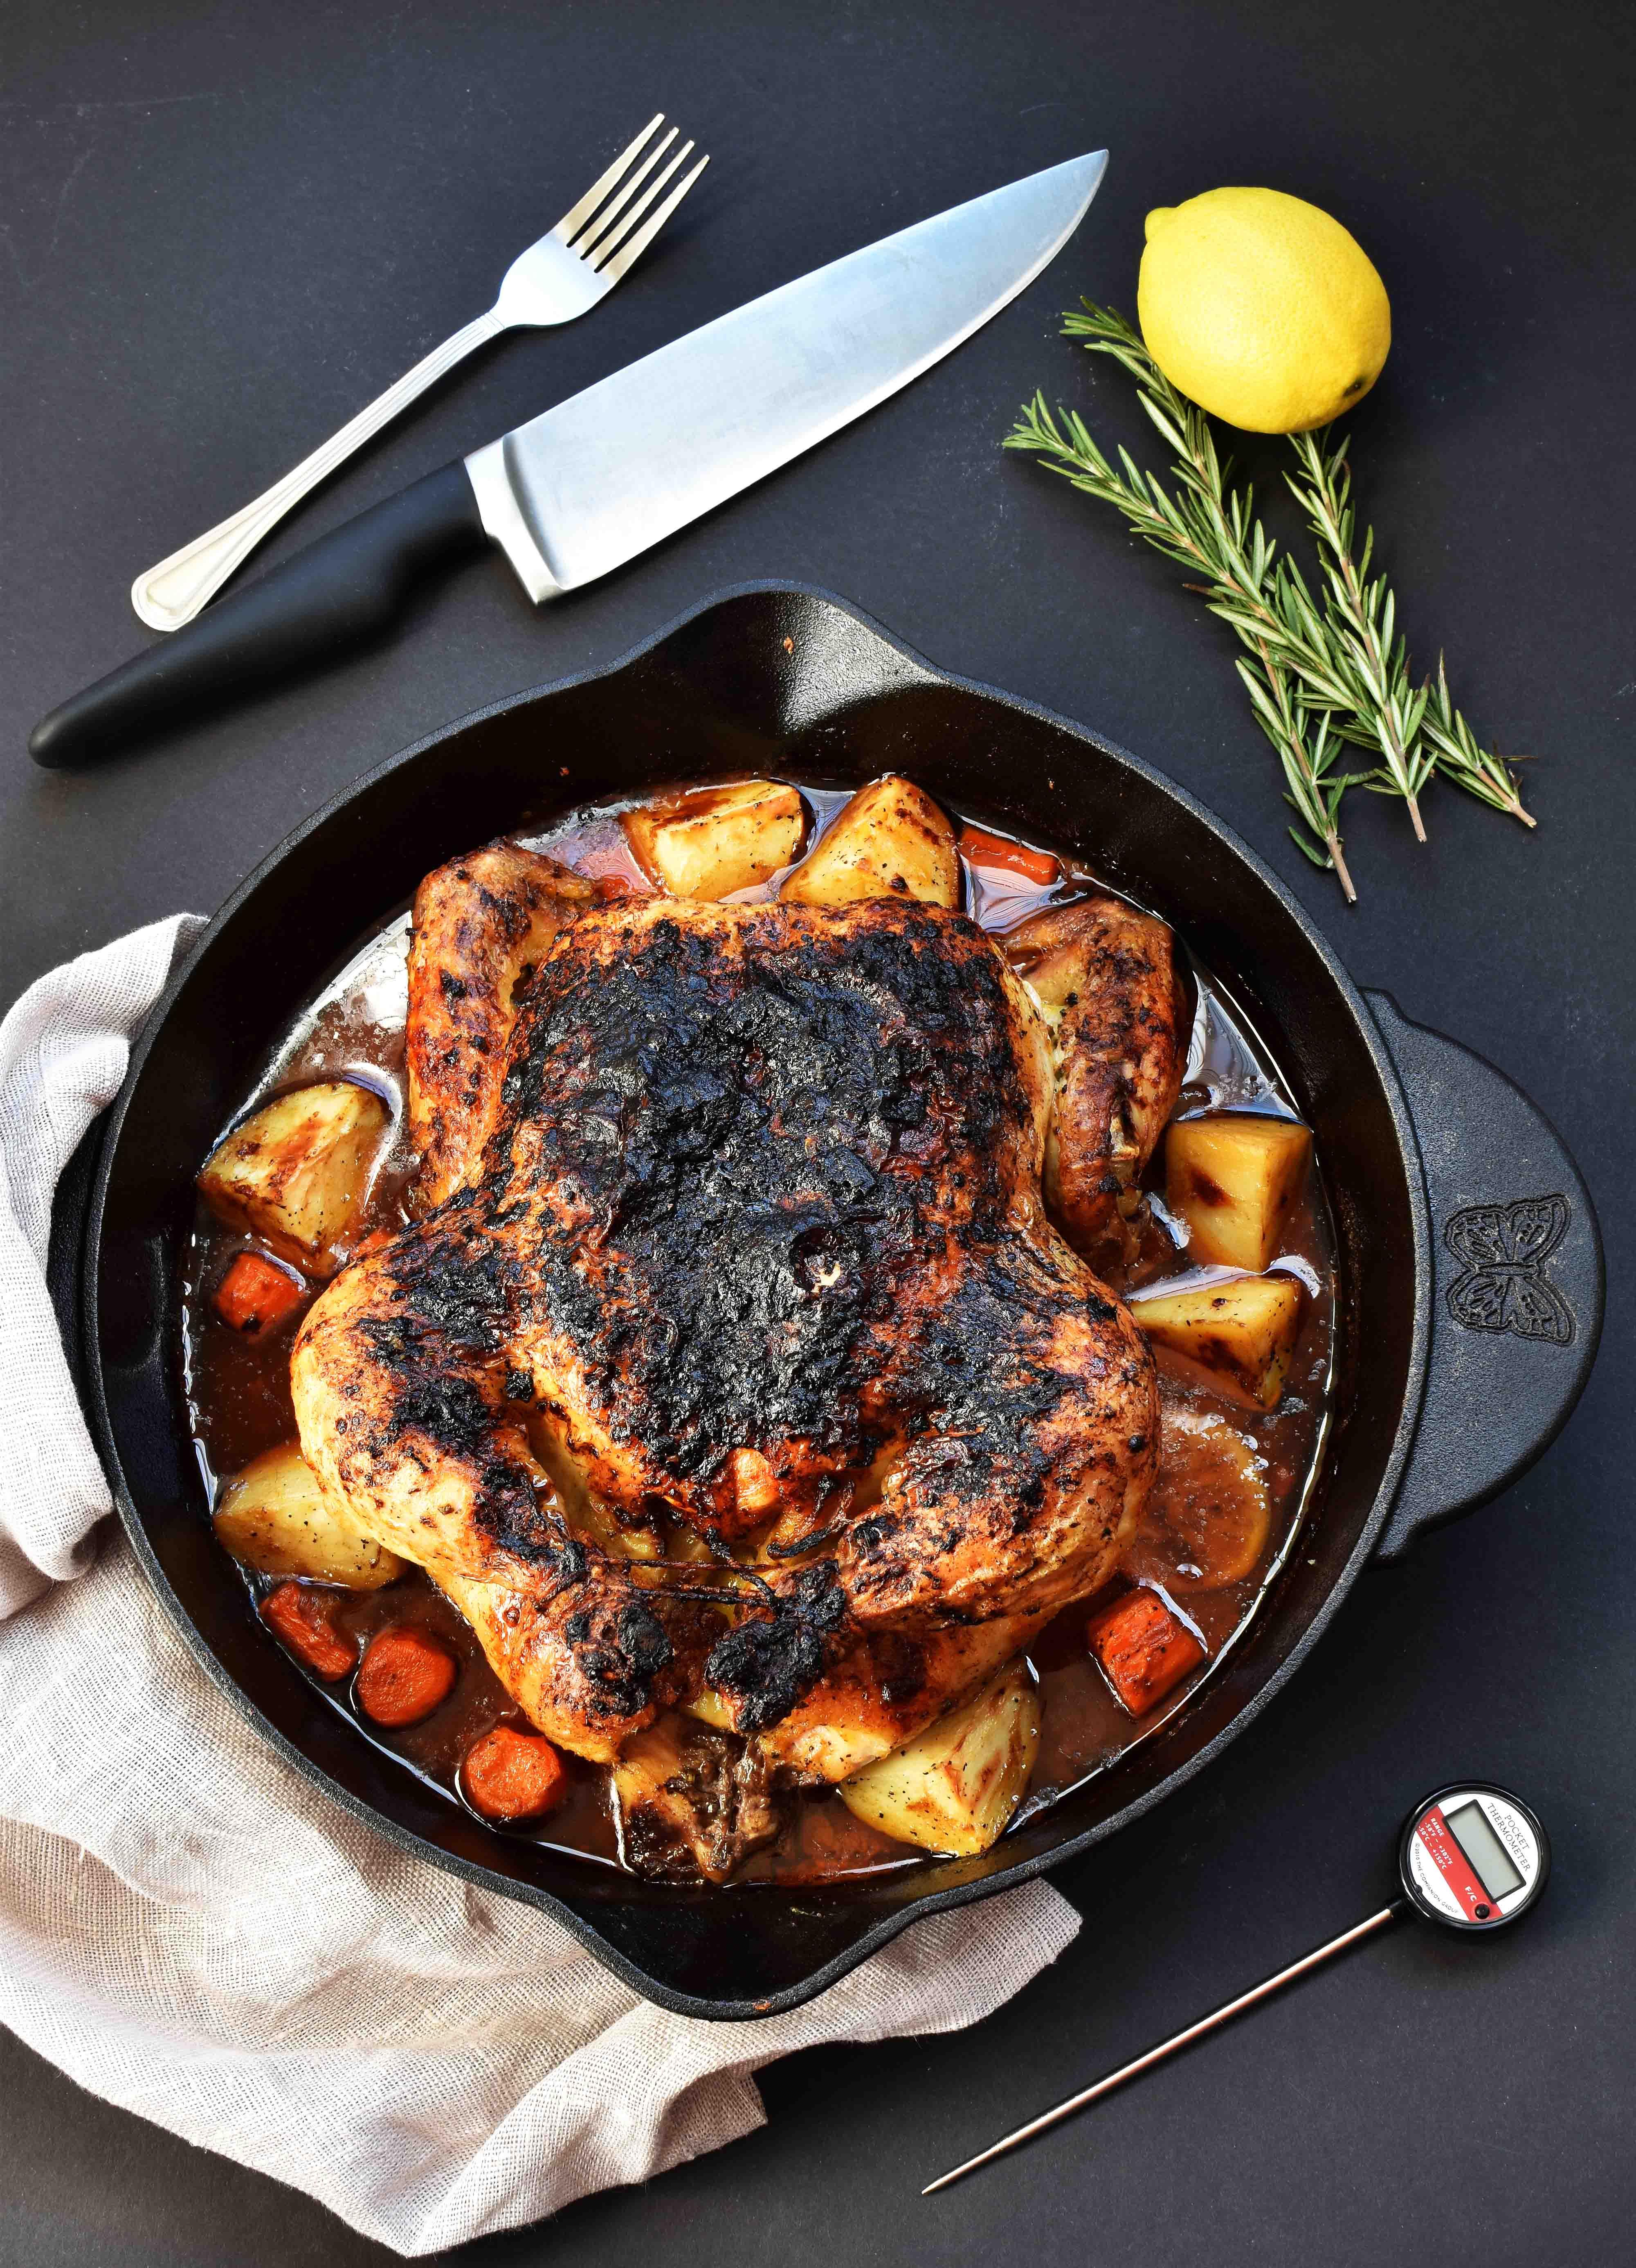 Garlic Rosemary Whole Roasted Chicken - Pepper Delight #pepperdelightblog #recipe #chicken #turkey #wholeroastedchicken #mashedpotatoes #thanksgiving #christmasrecipes